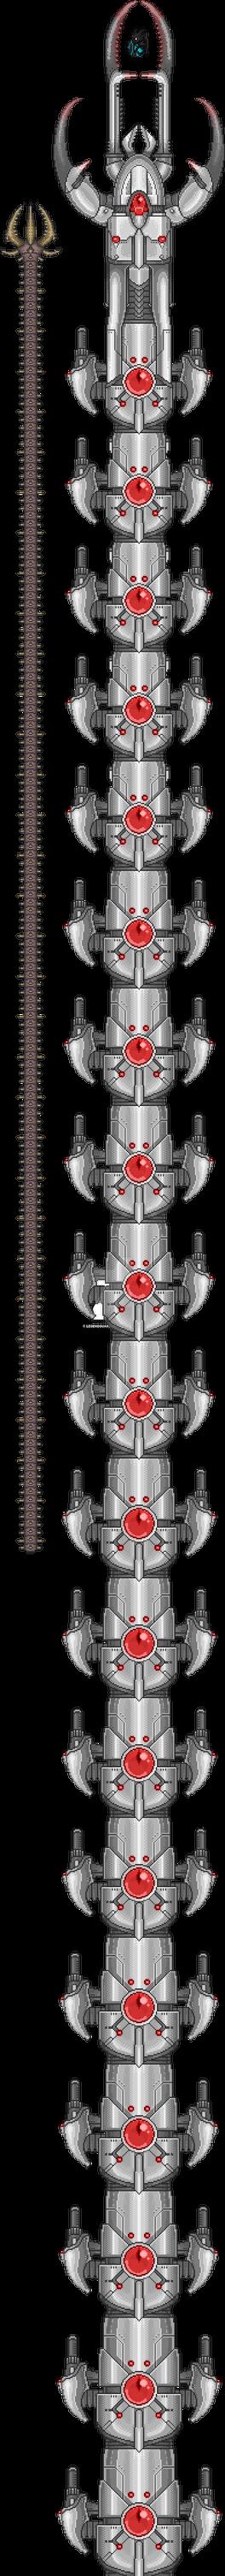 [Terraria] The True Destroyer (first 20 segments) by legendguard